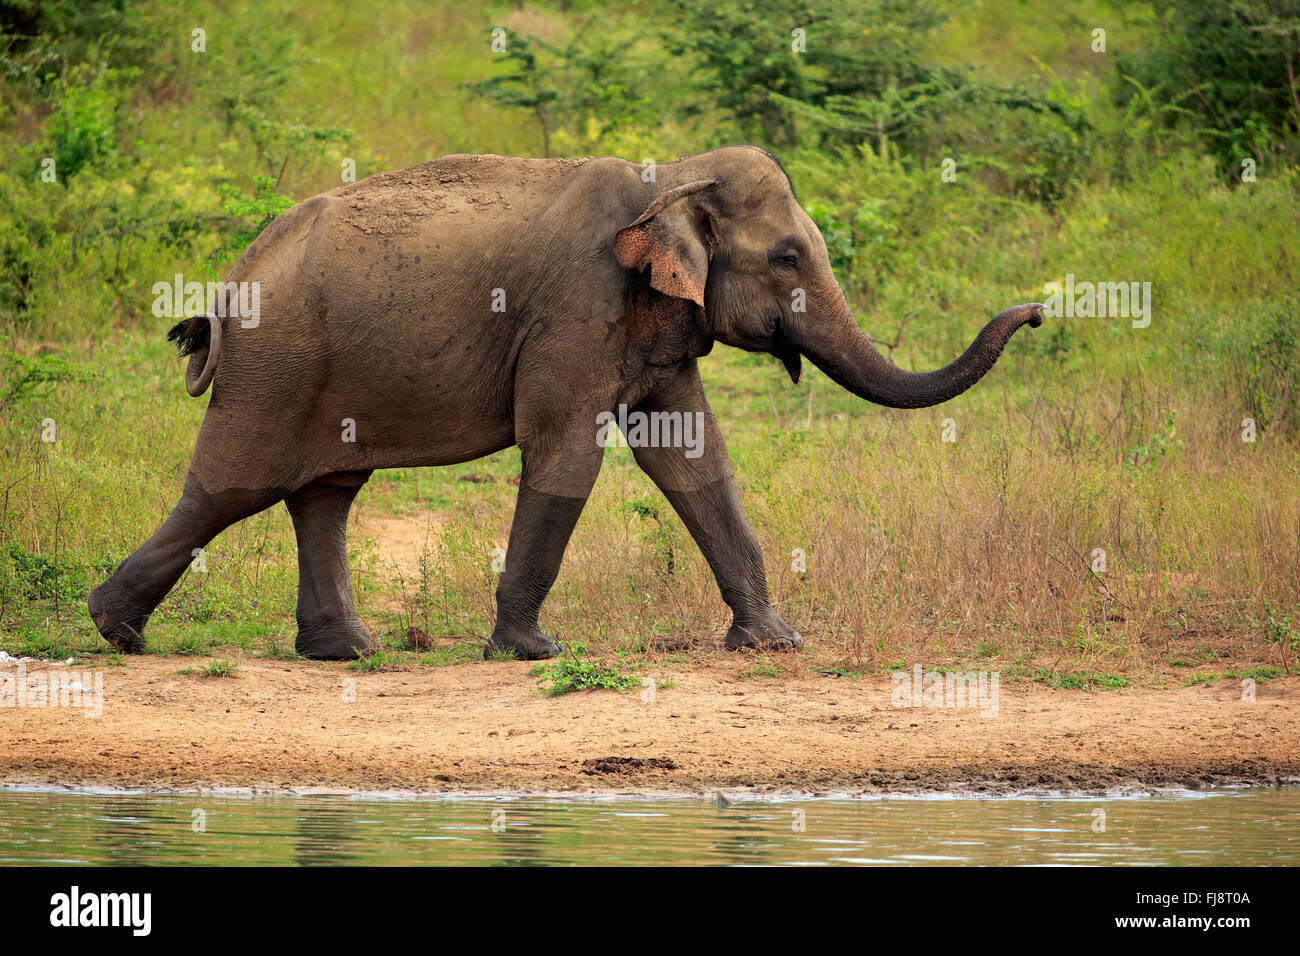 Adult Guide Sri Lanka